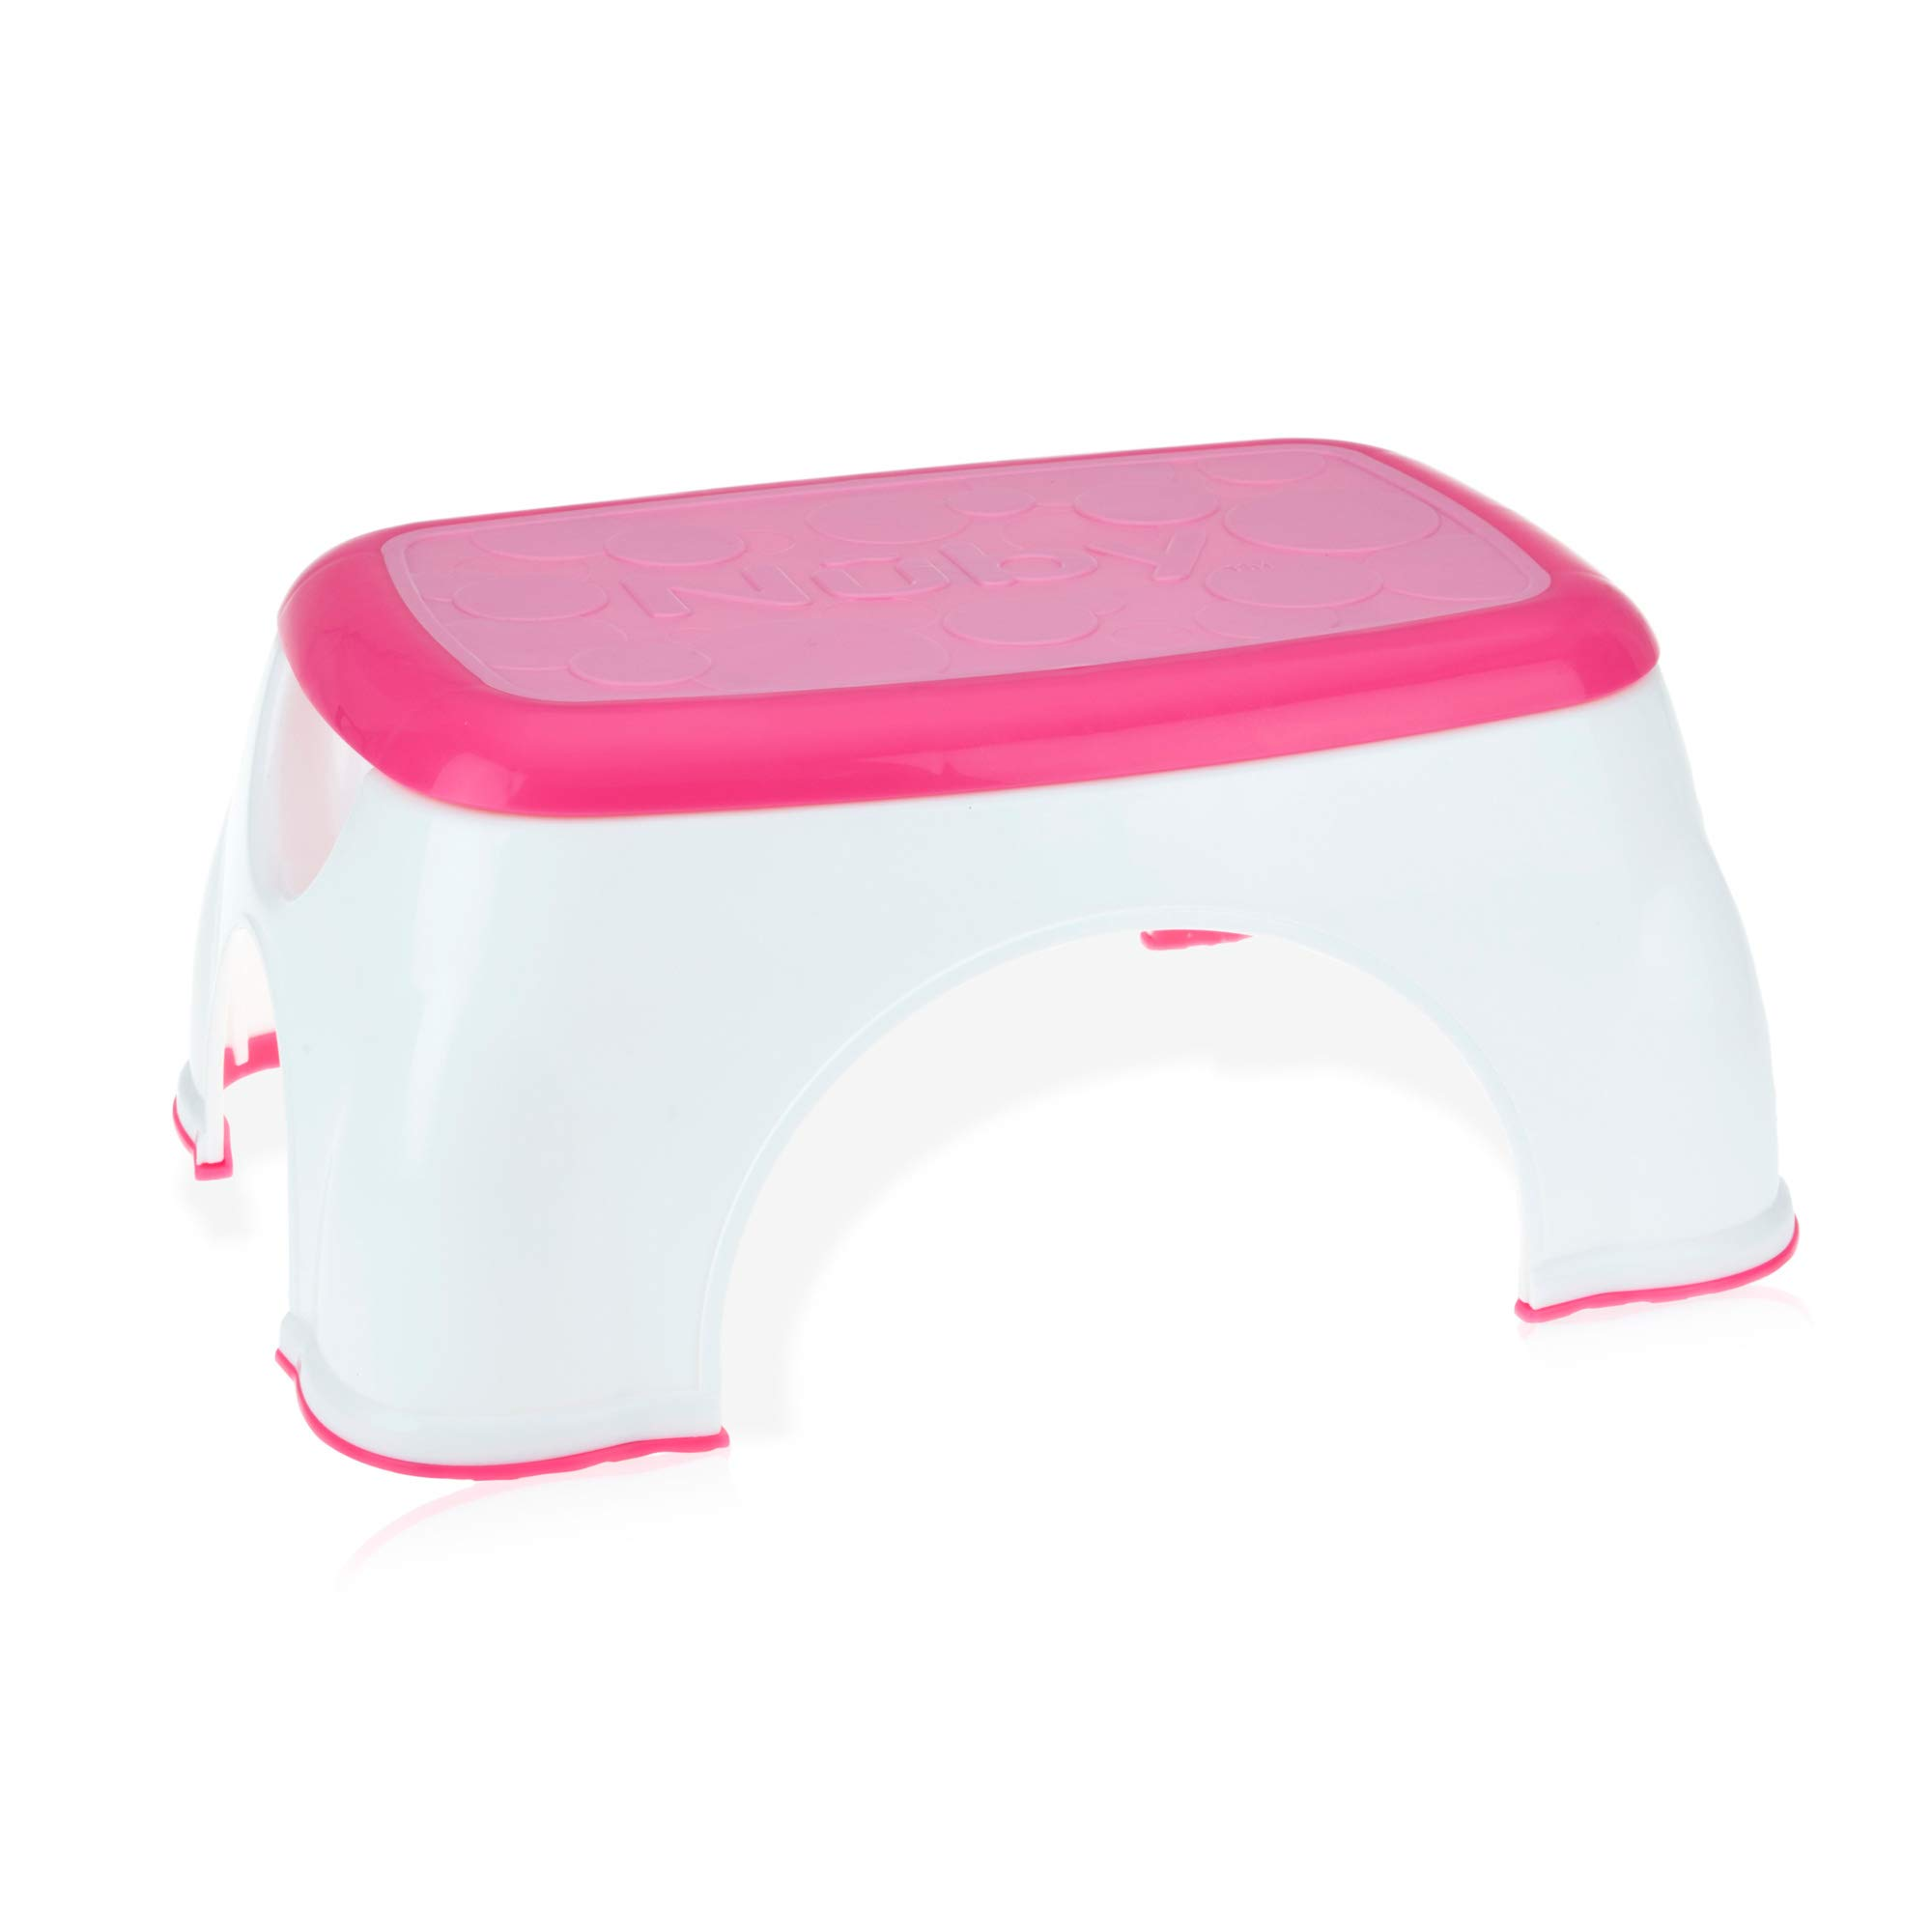 Nuby Step Up Stool, Pink by Nuby